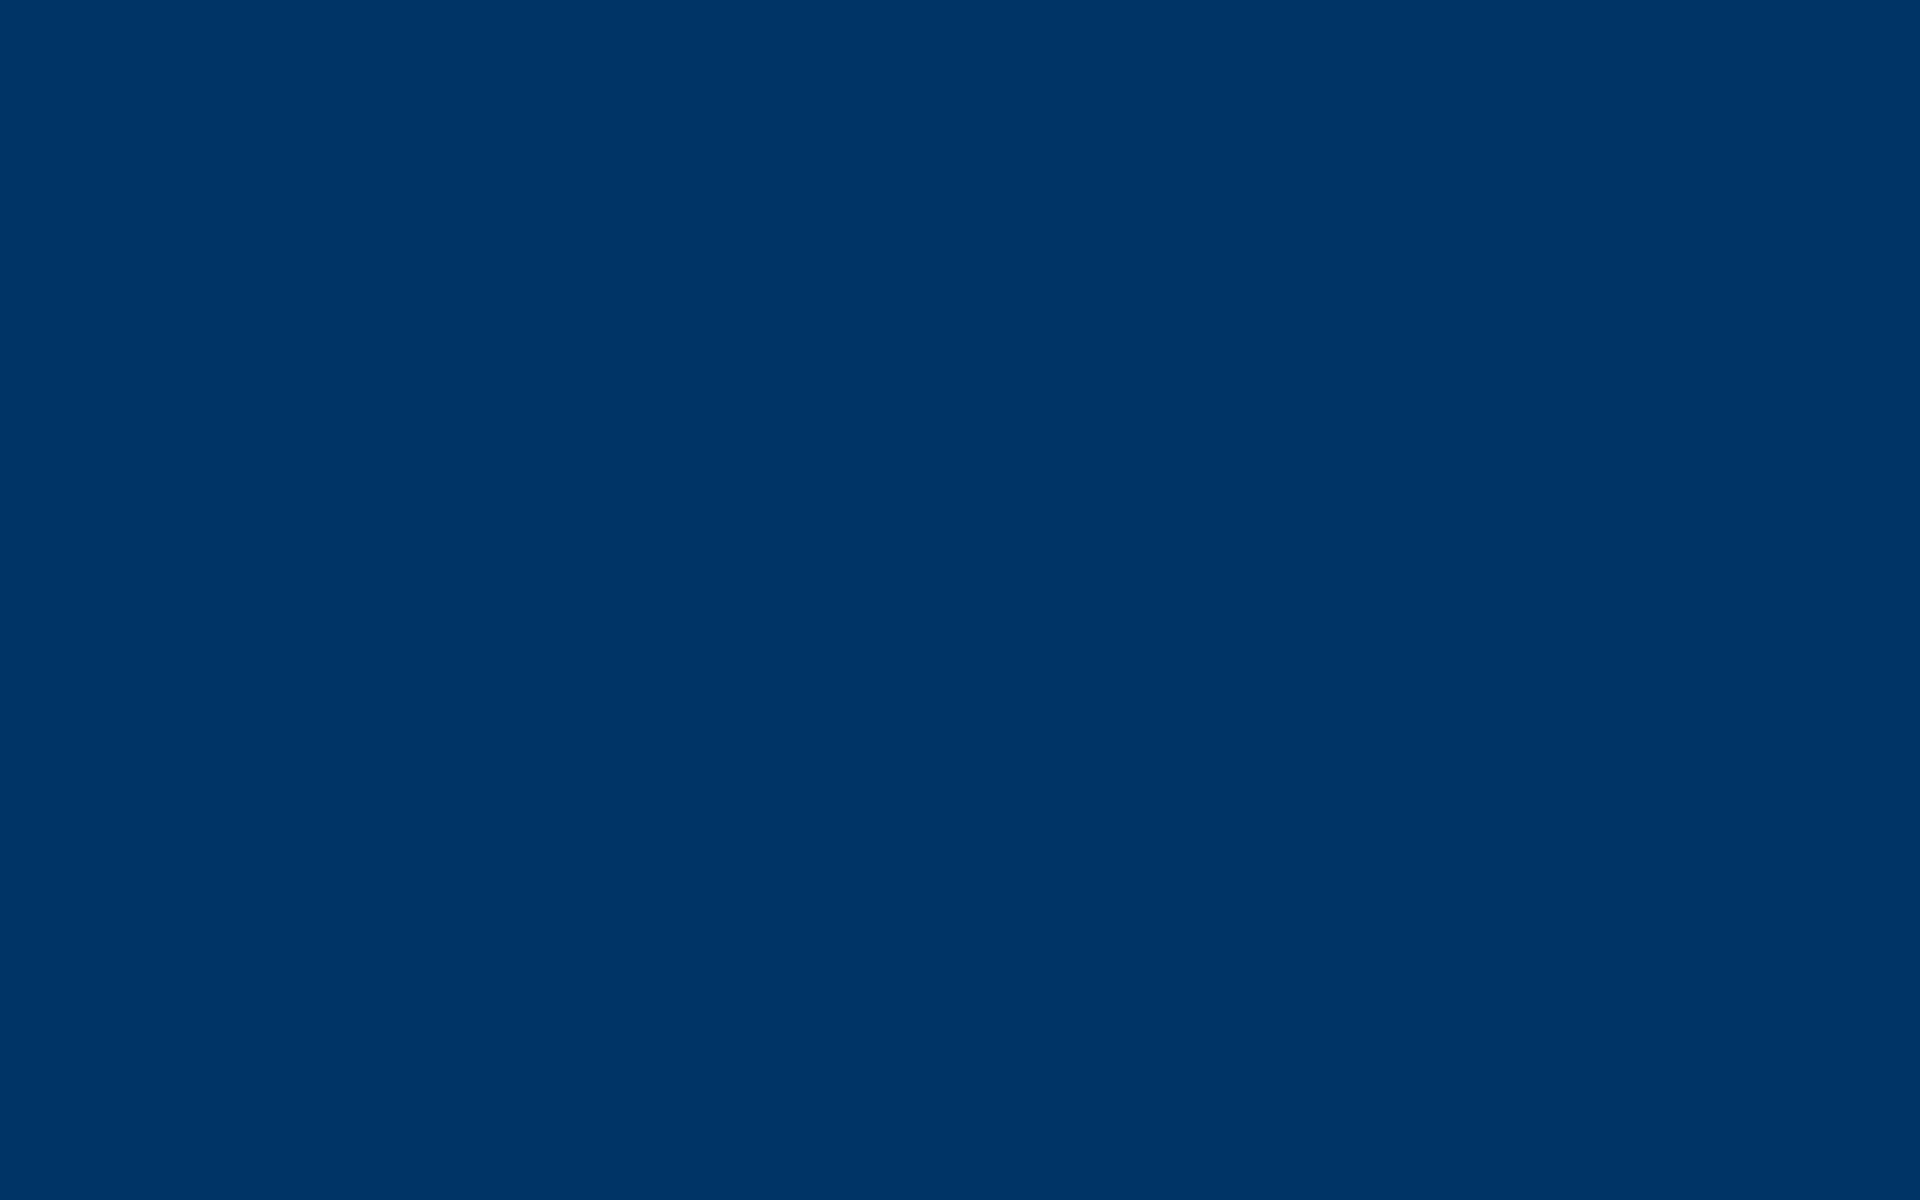 1920x1200 Dark Midnight Blue Solid Color Background